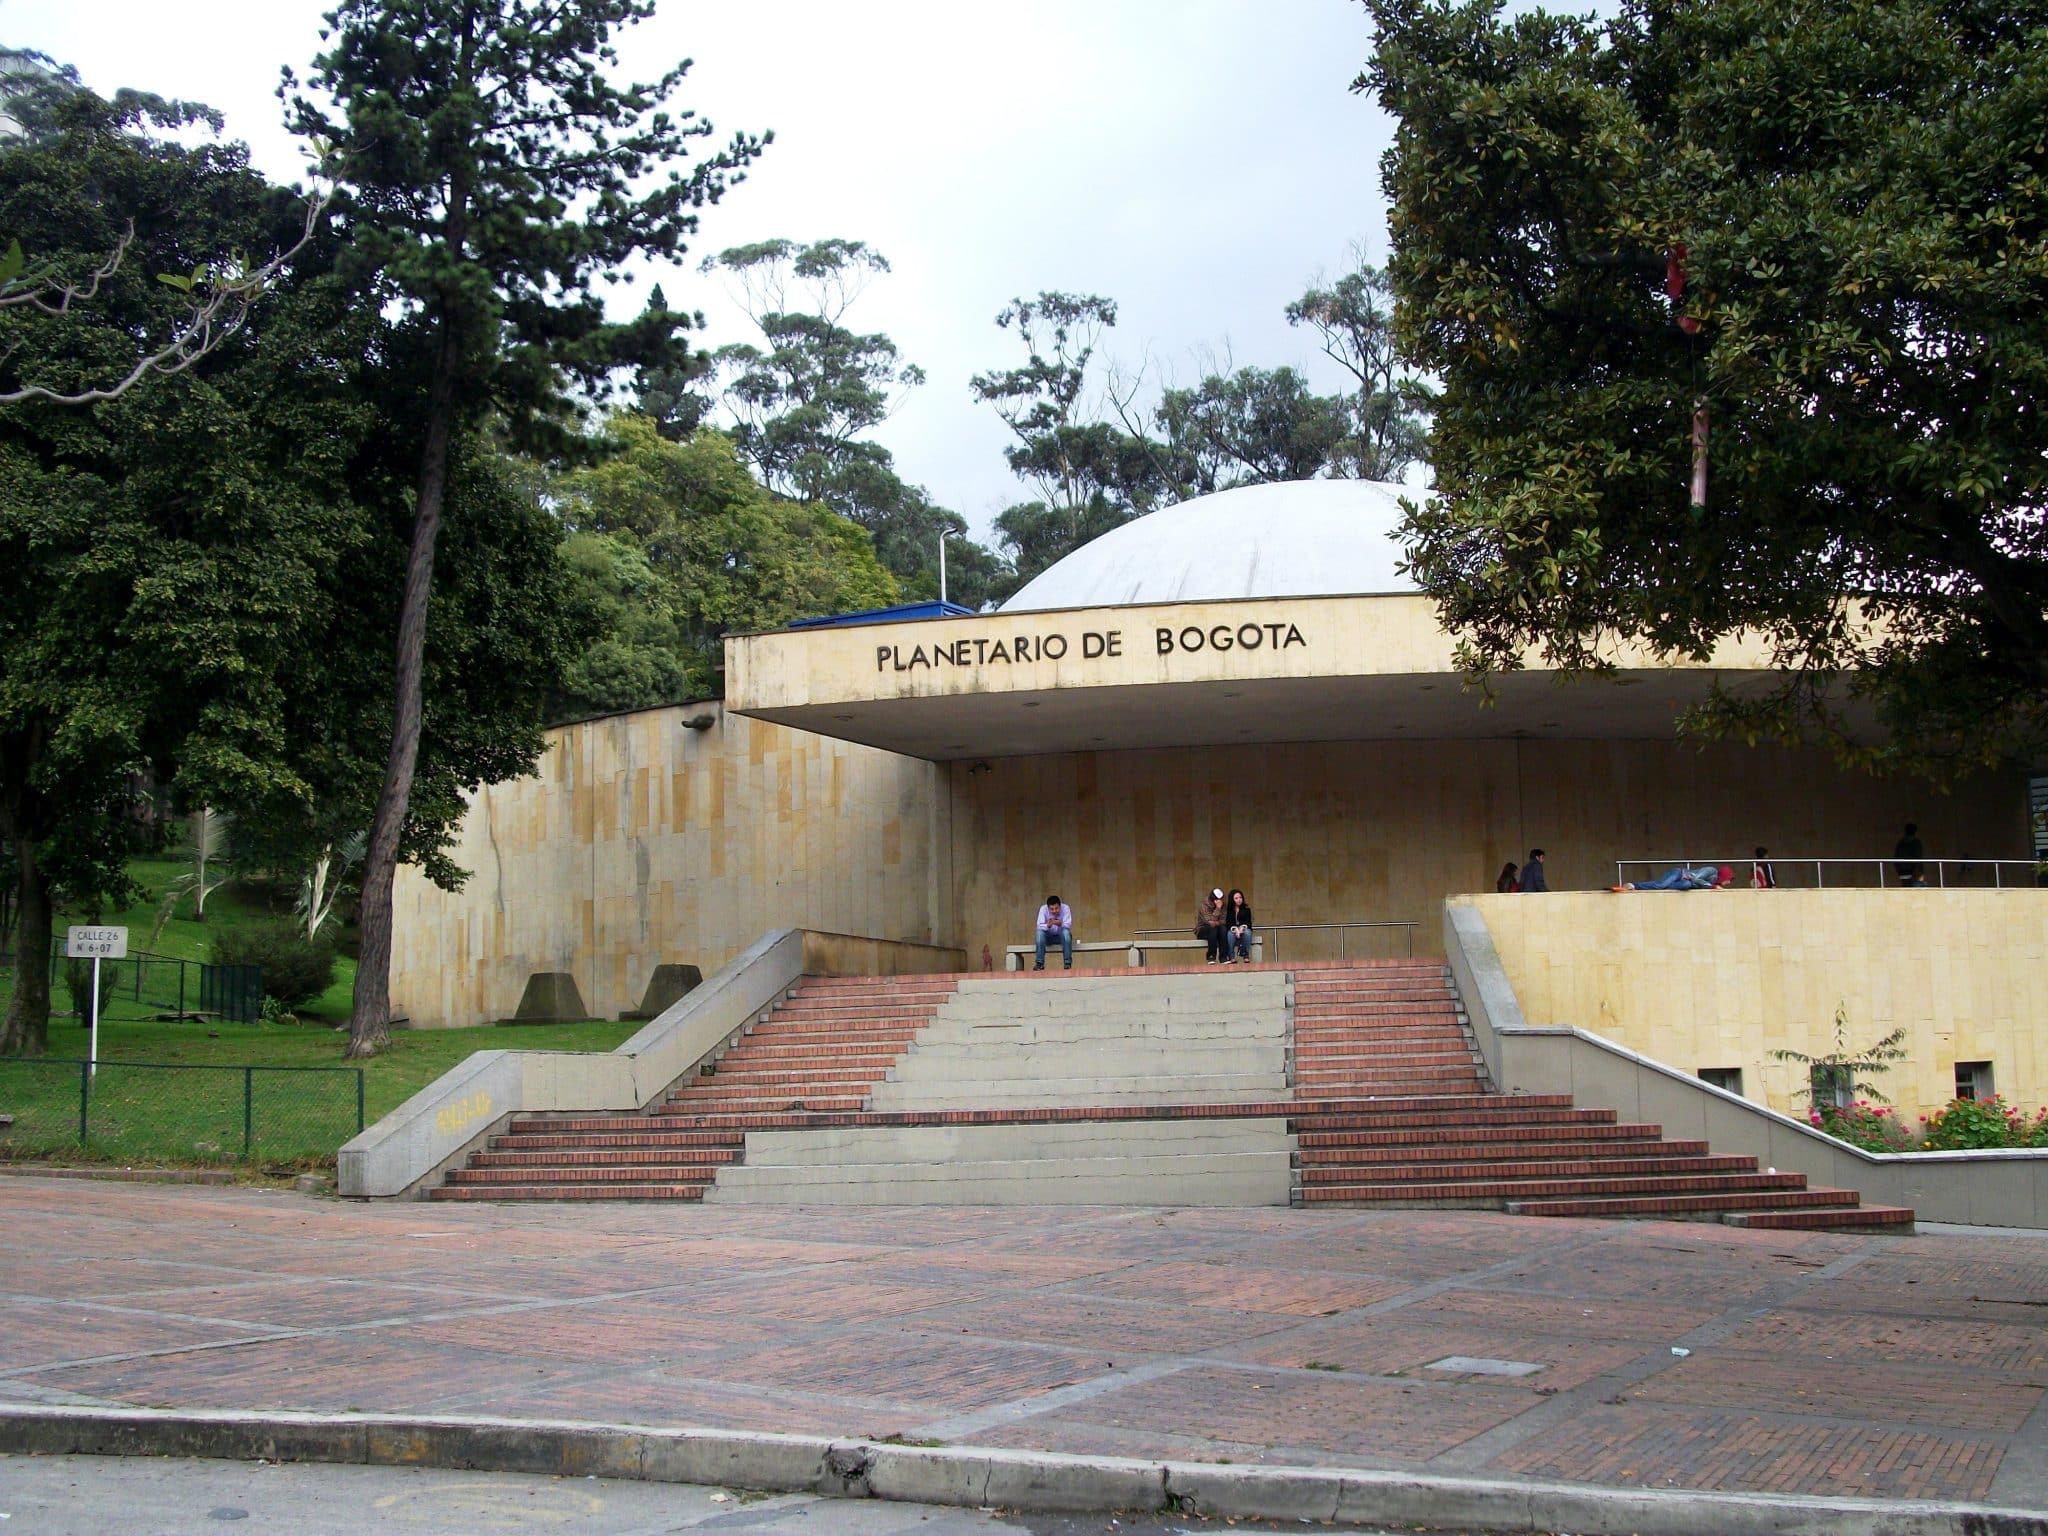 Le planétarium de Bogota